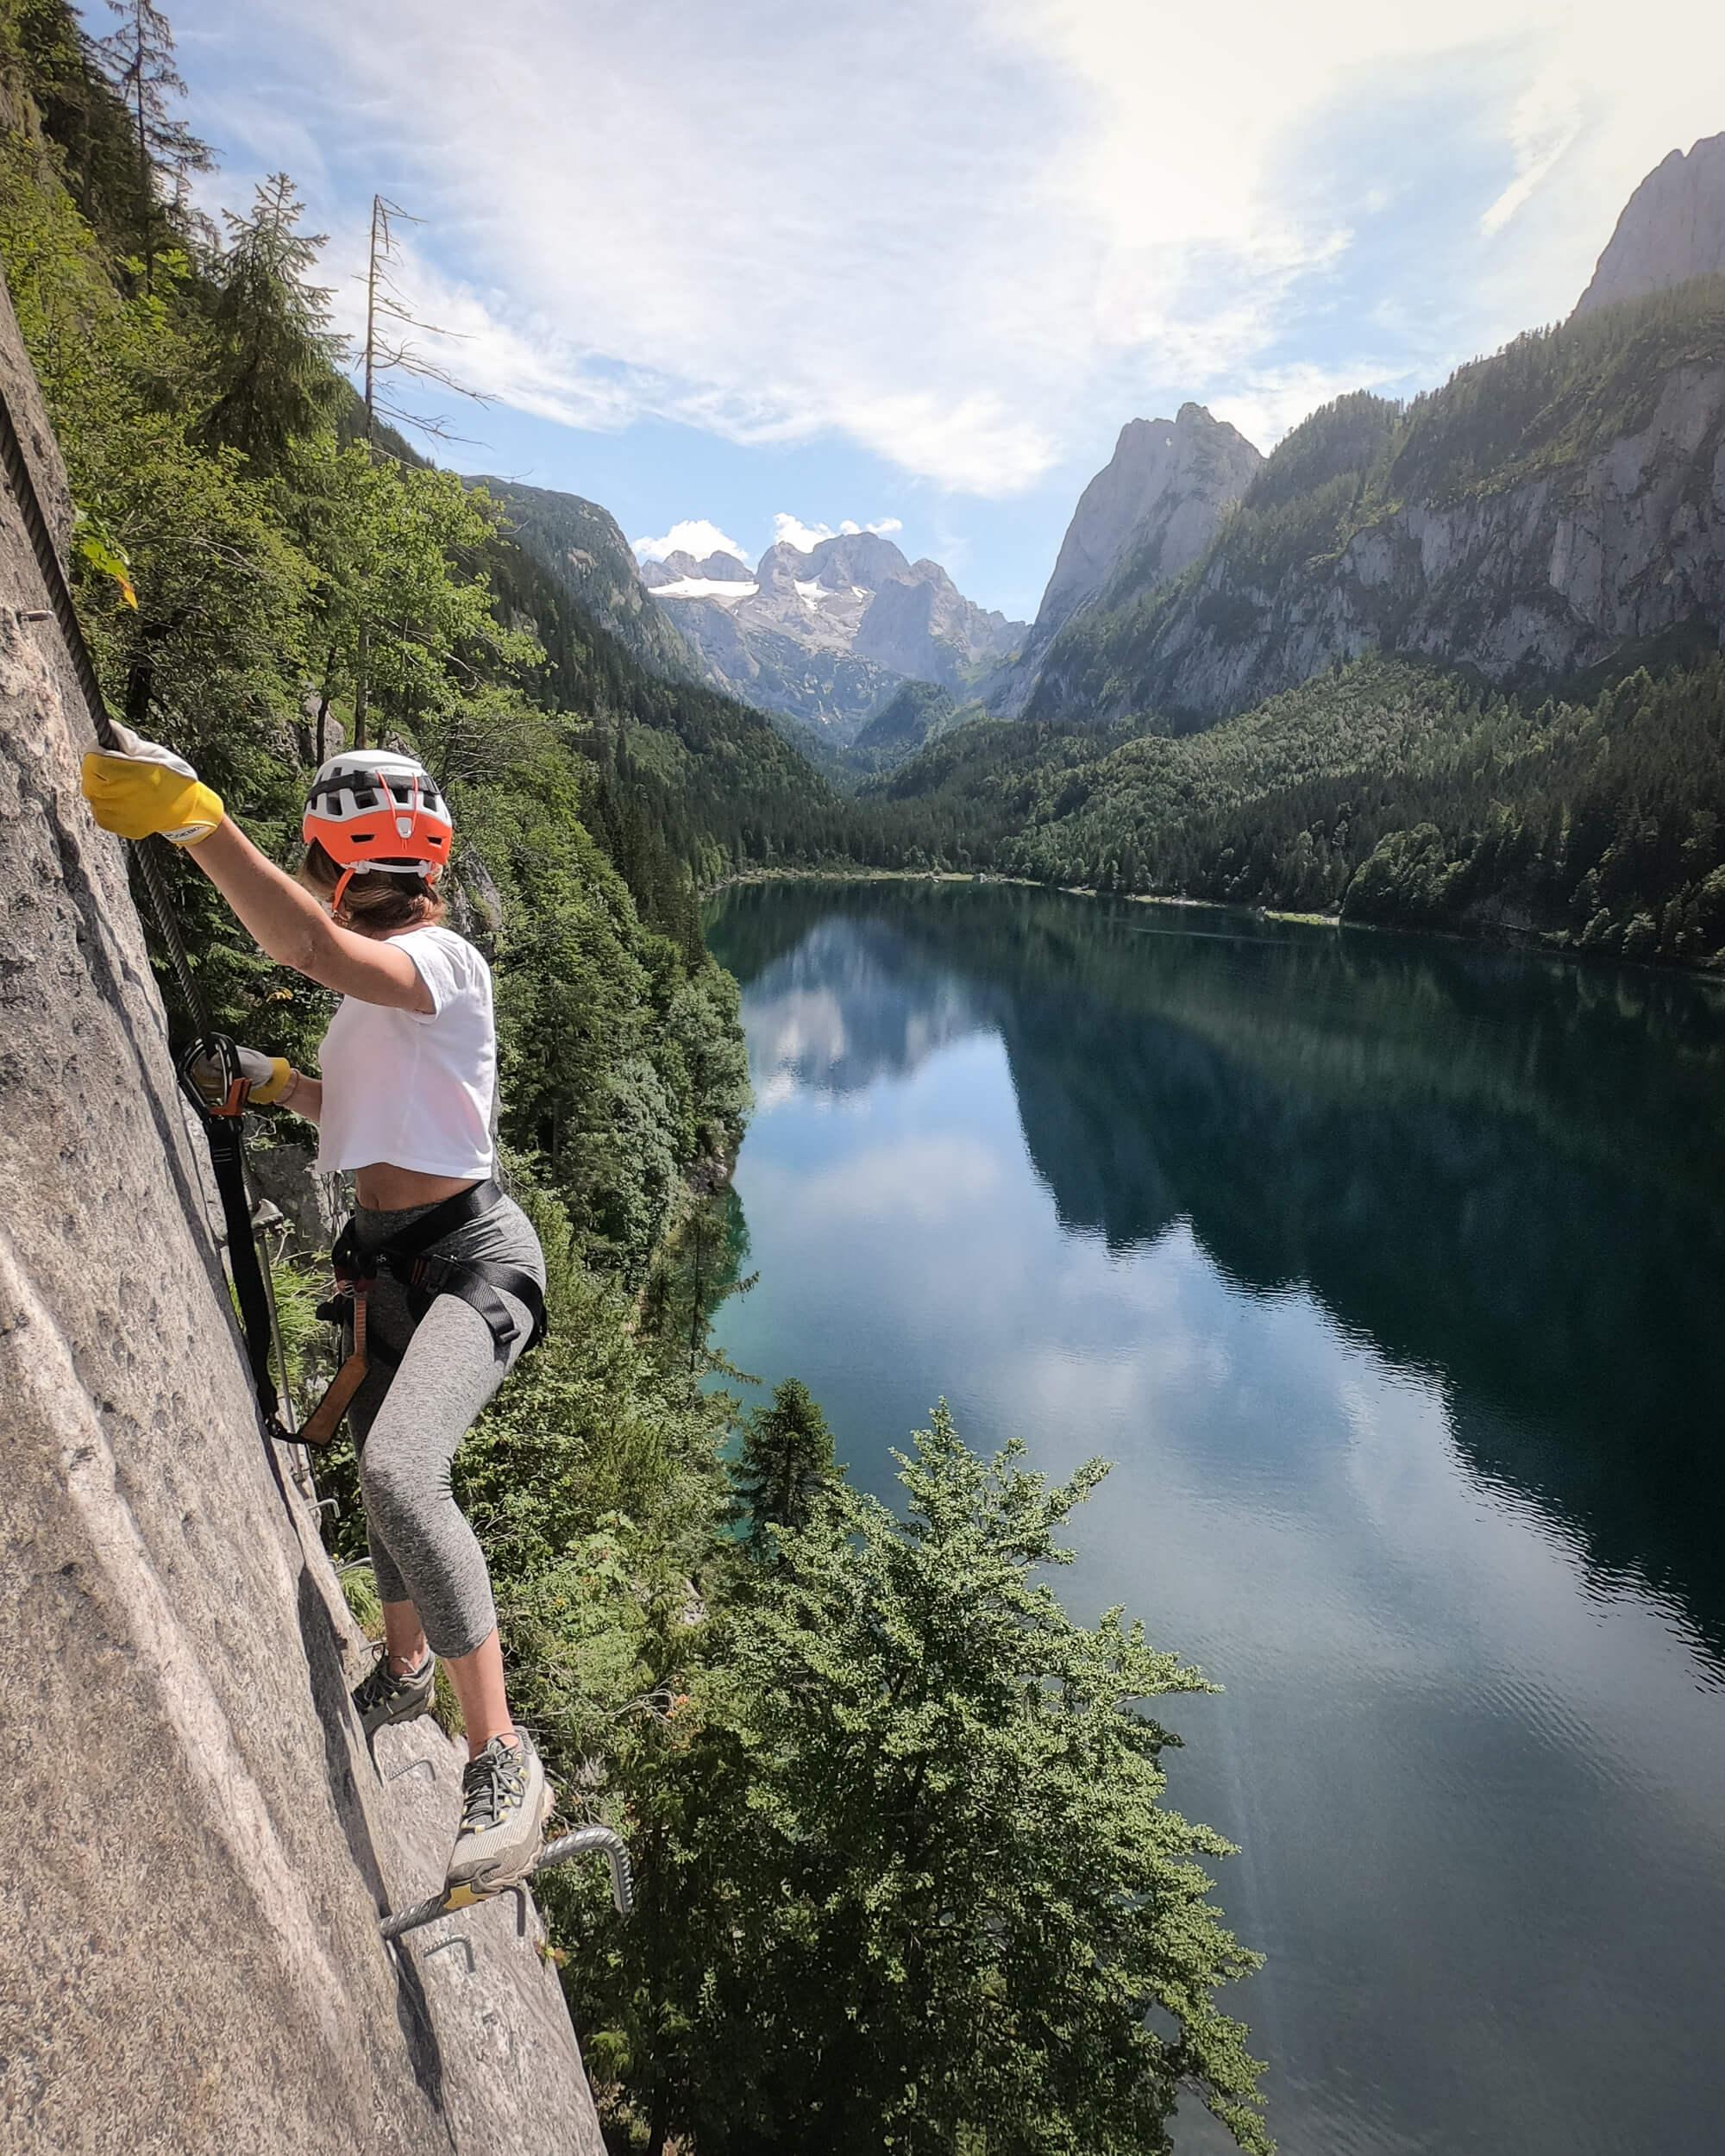 Climbing the Laserer via ferrata. Wearing:  leggings ,  trail running shoes ,  helmet .